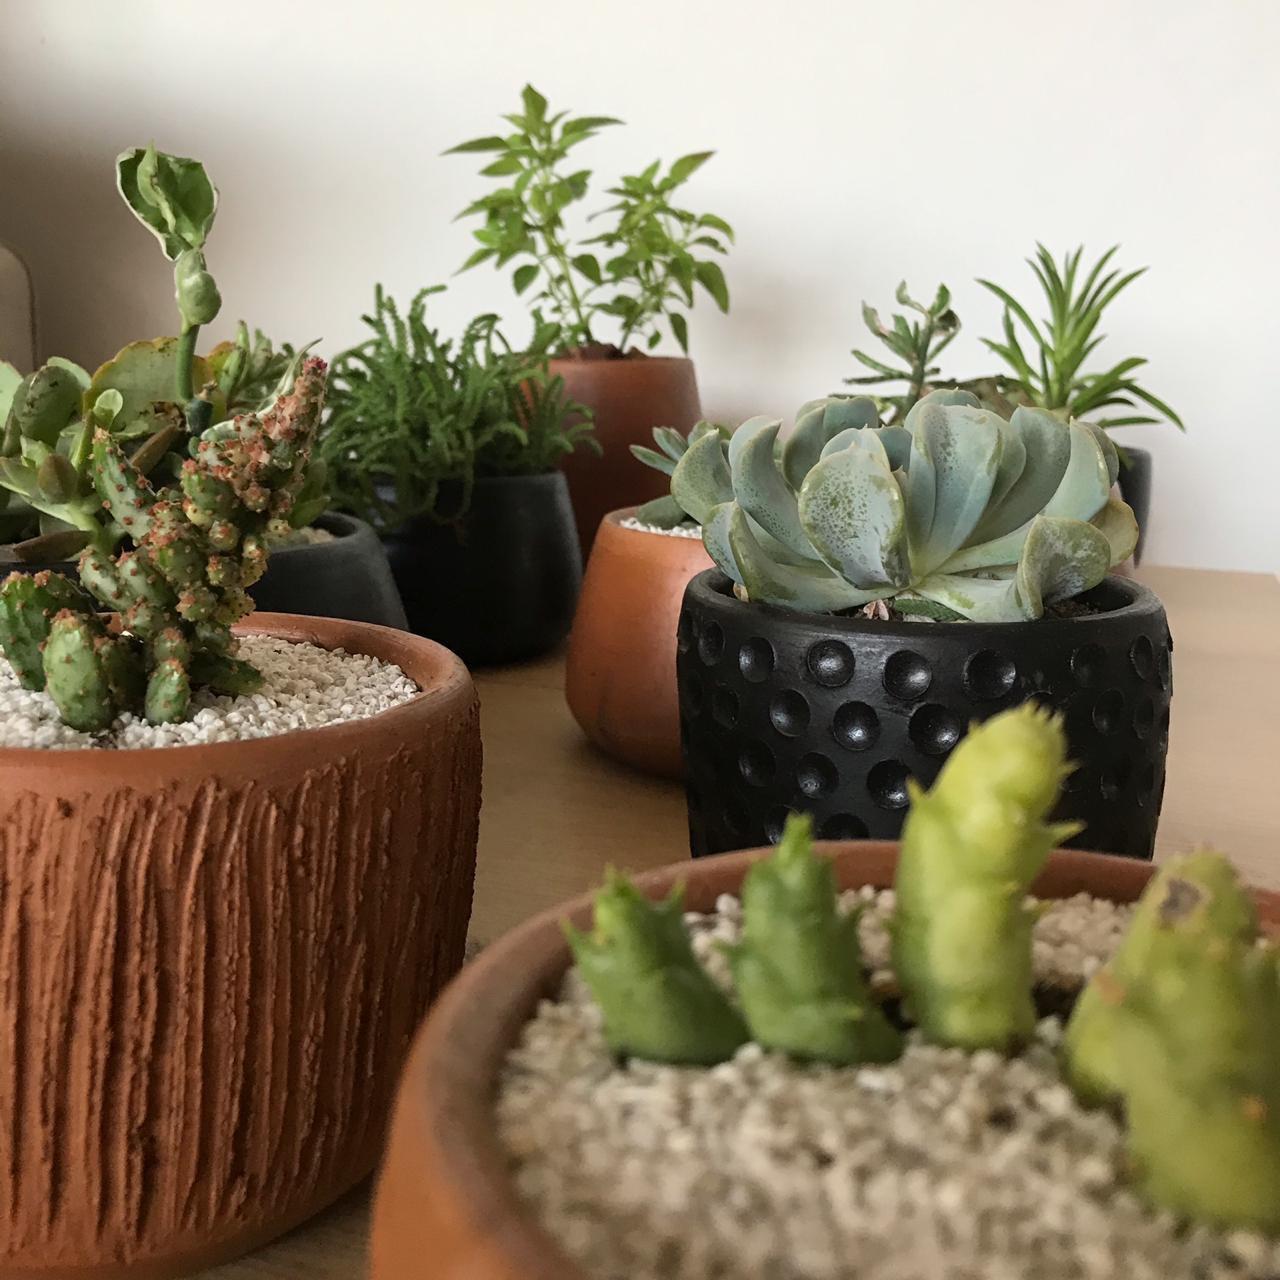 cactus miniatura comprar